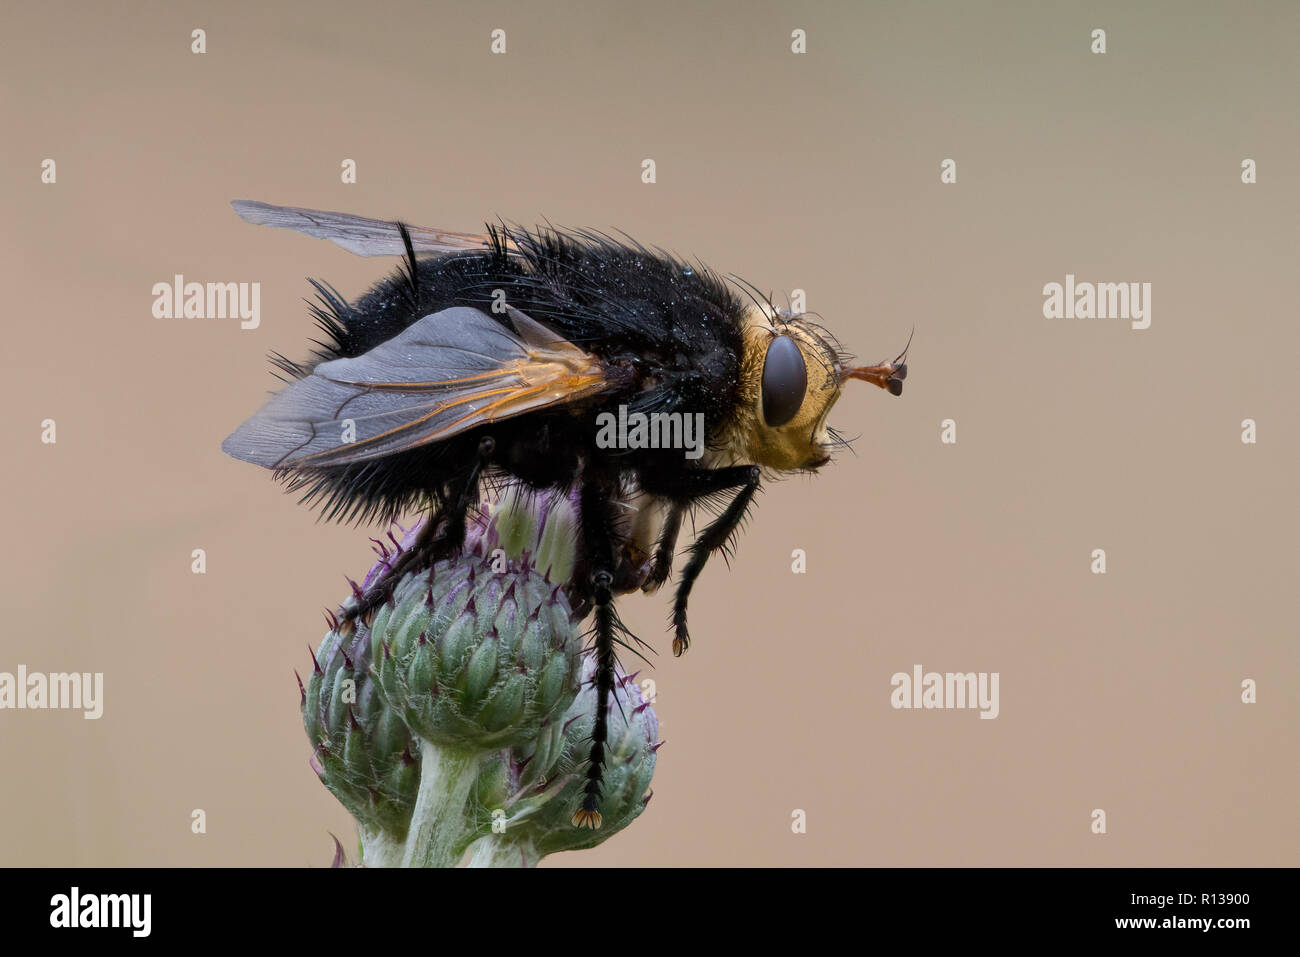 Giant tachnid fly (Tachina grossa) on flowerheads of Creeping Thistle (Cirsium arvense) - Stock Image